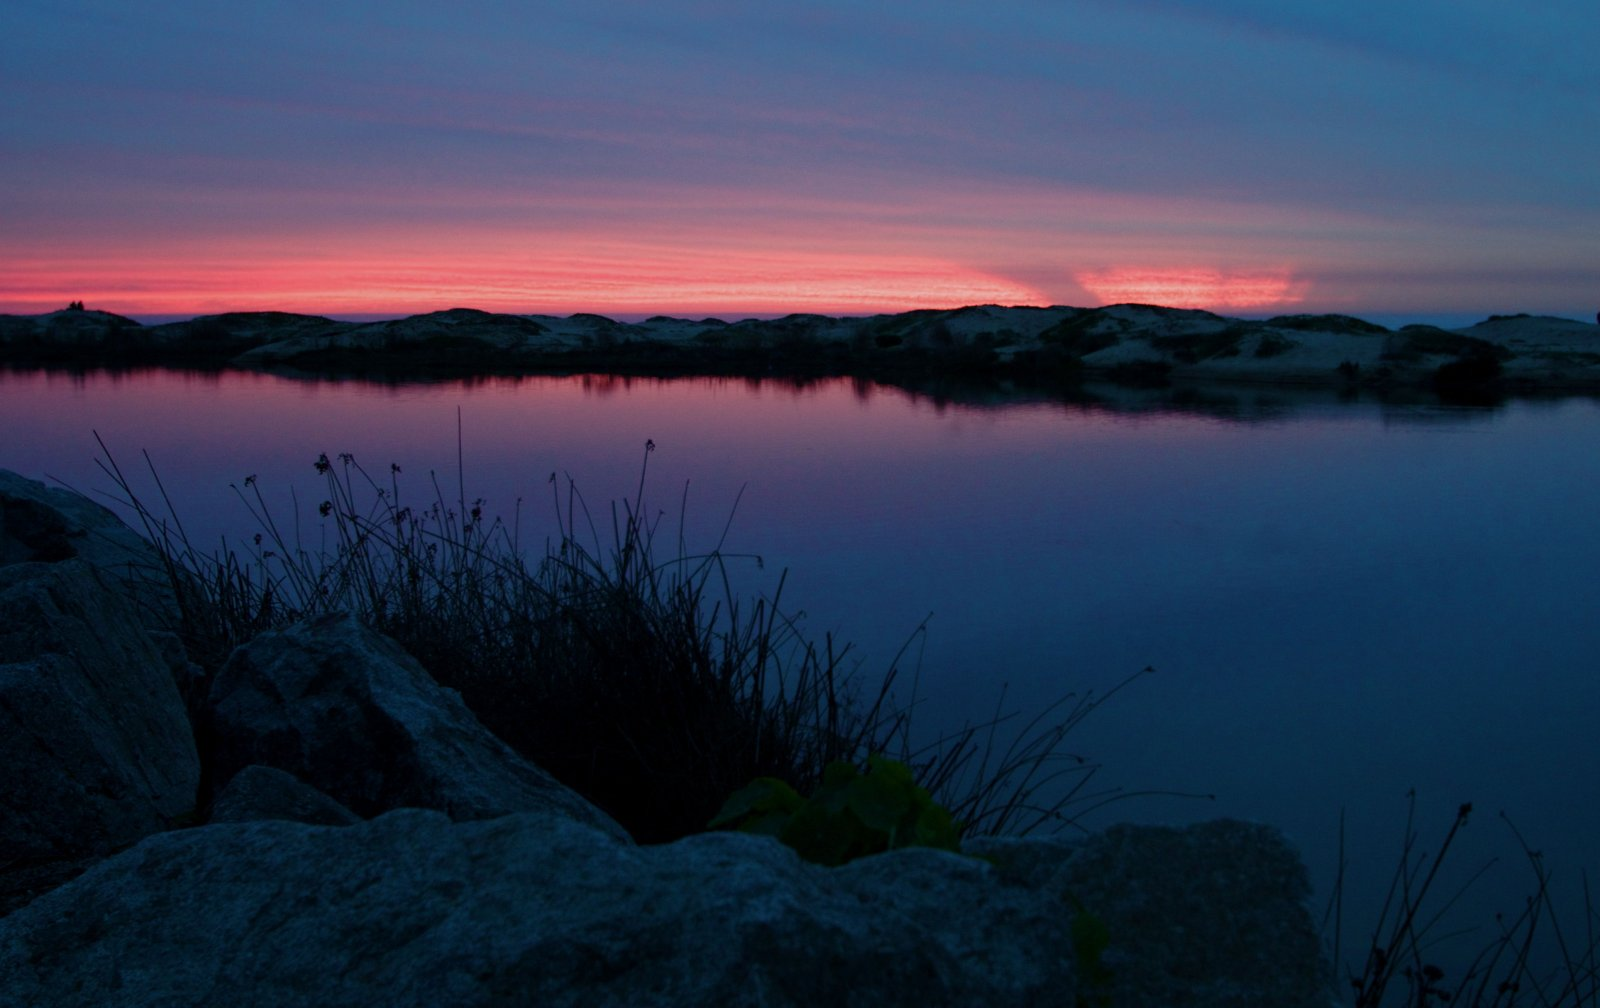 Click image for larger version  Name:Landscape 2.jpg Views:74 Size:144.5 KB ID:94728